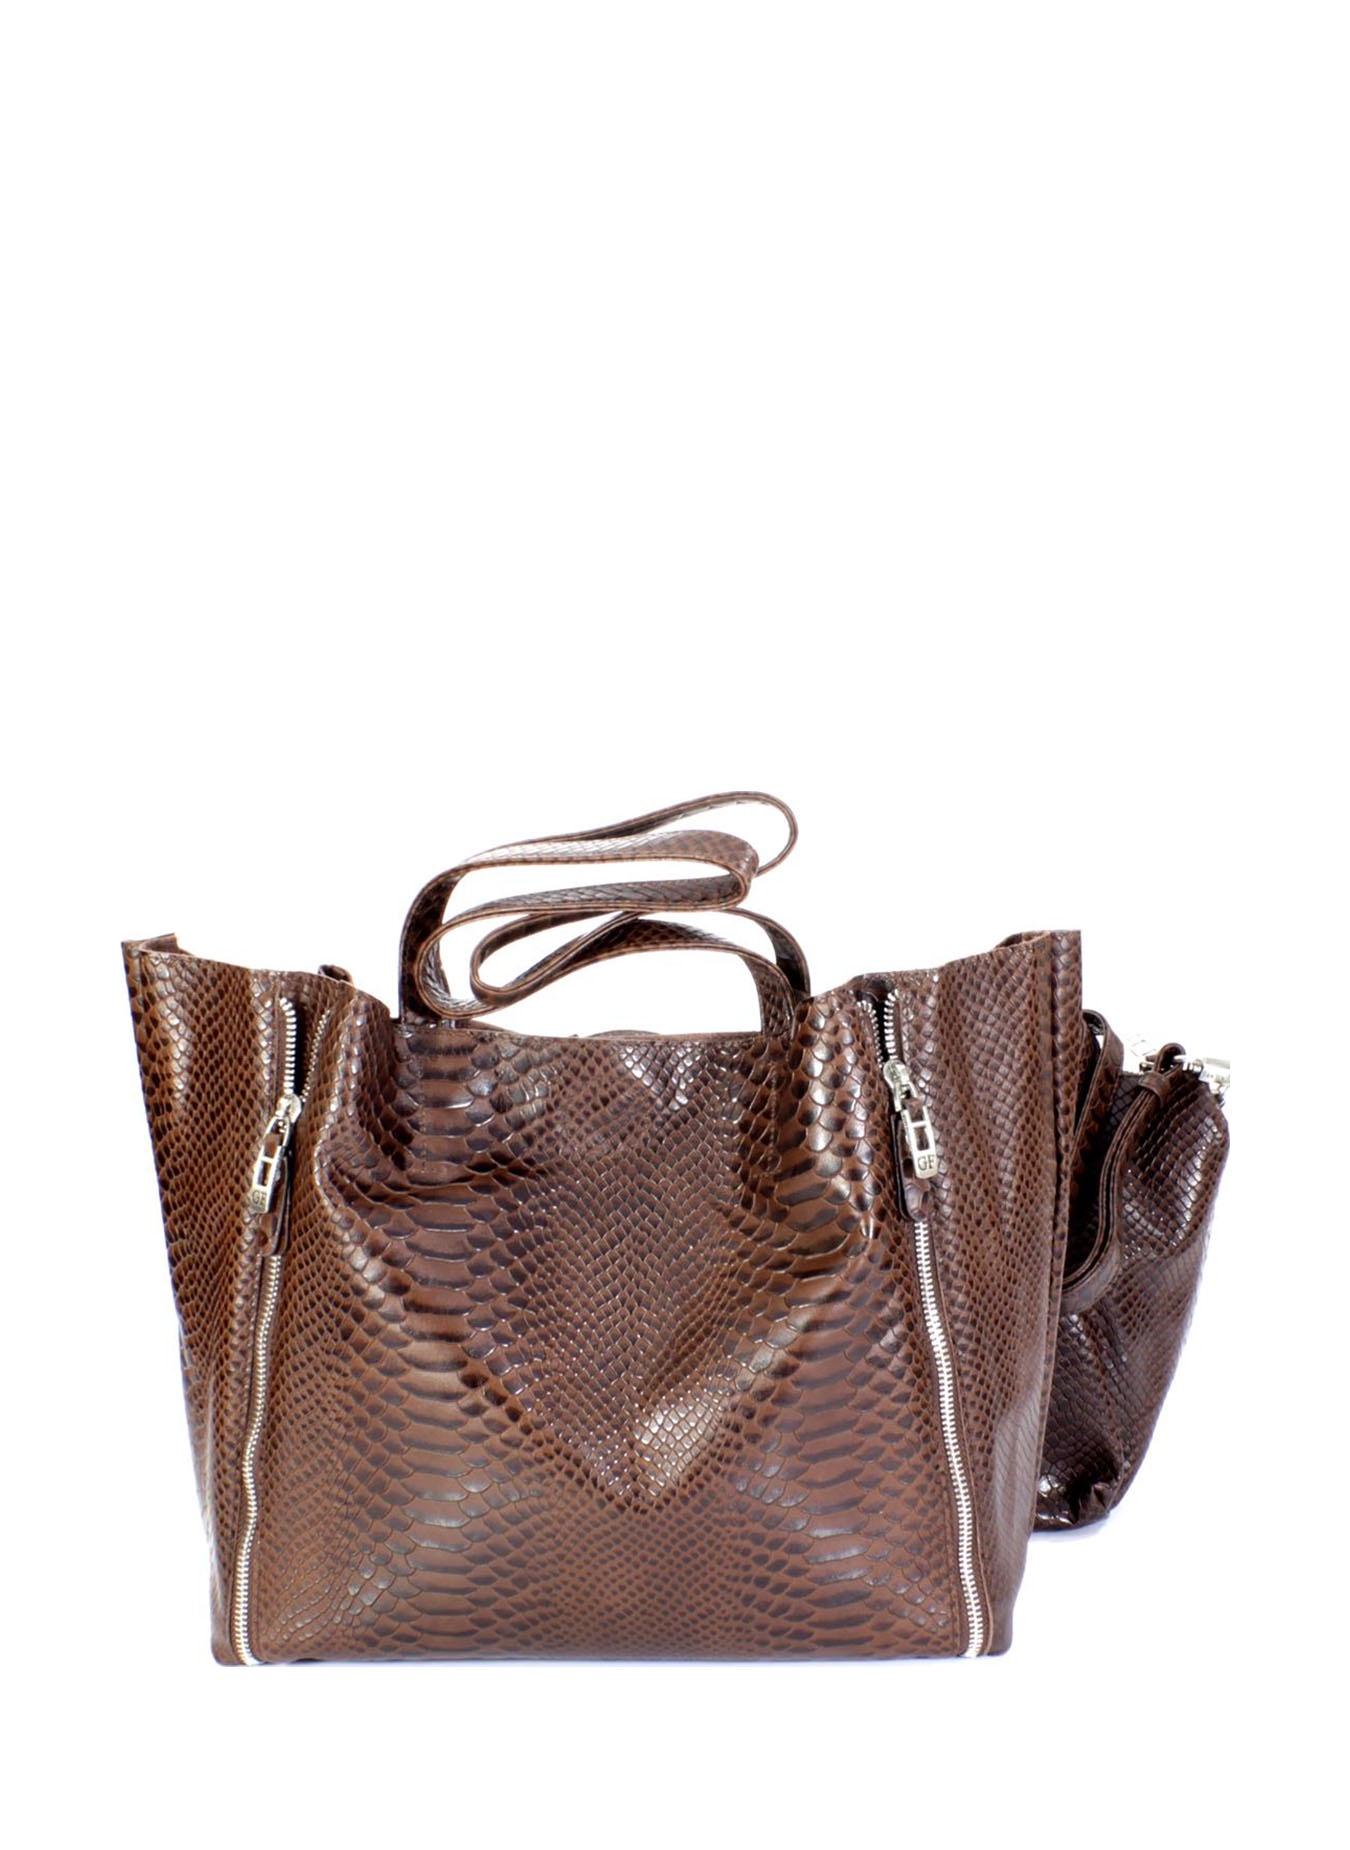 цены Сумка на плечо Giorgio Ferretti 32433 3 coffee GF, коричневый